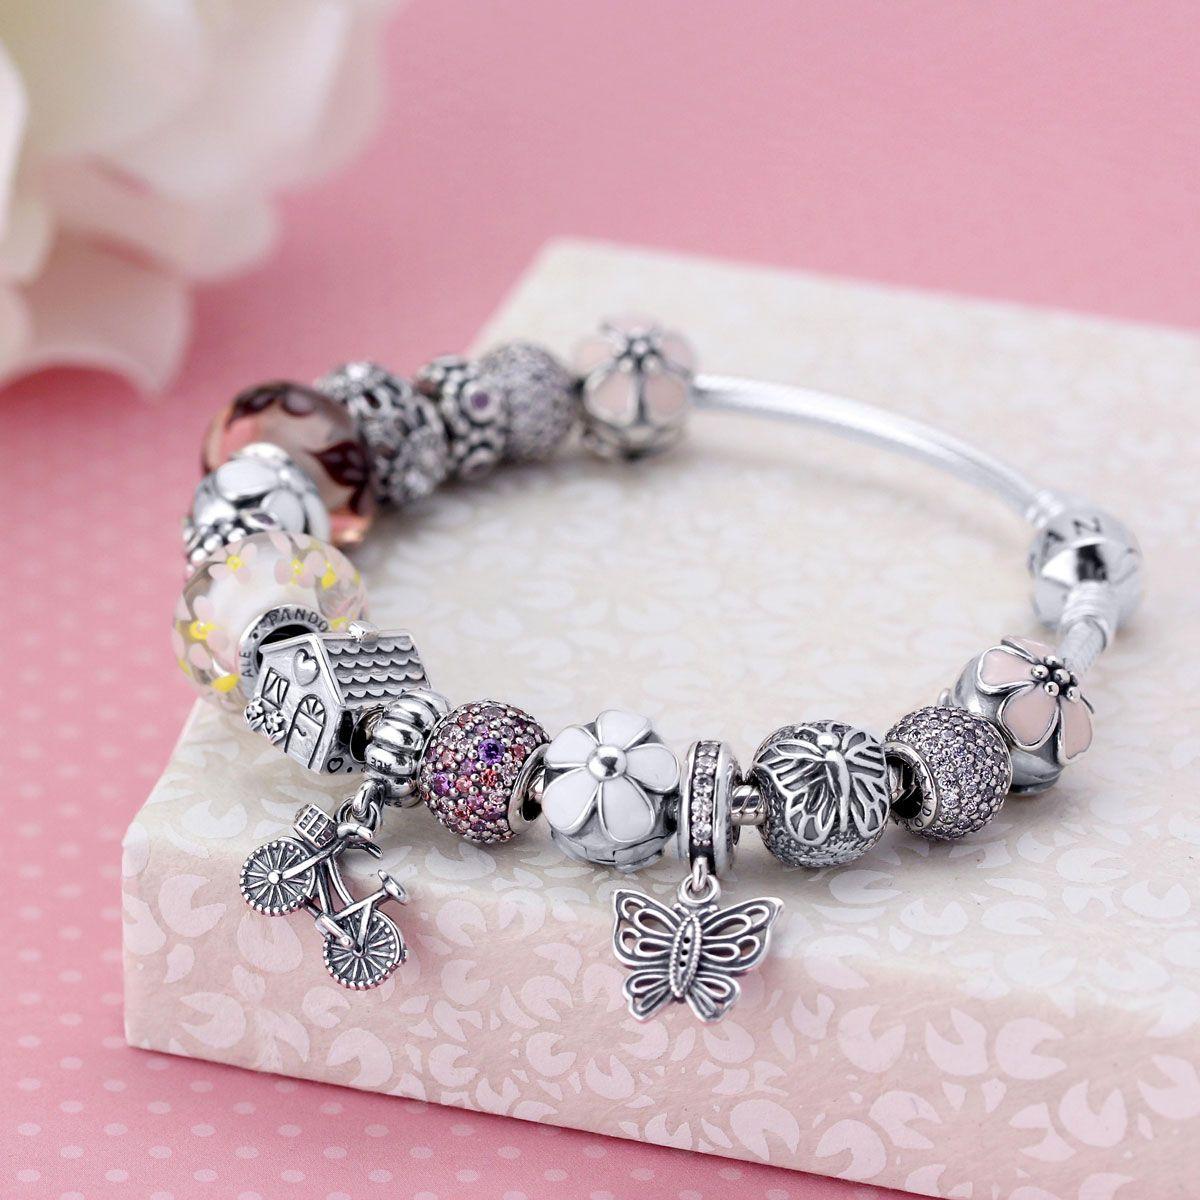 Pandora Charm Bracelet Ideas: Home > Pandora Finished Bracelets